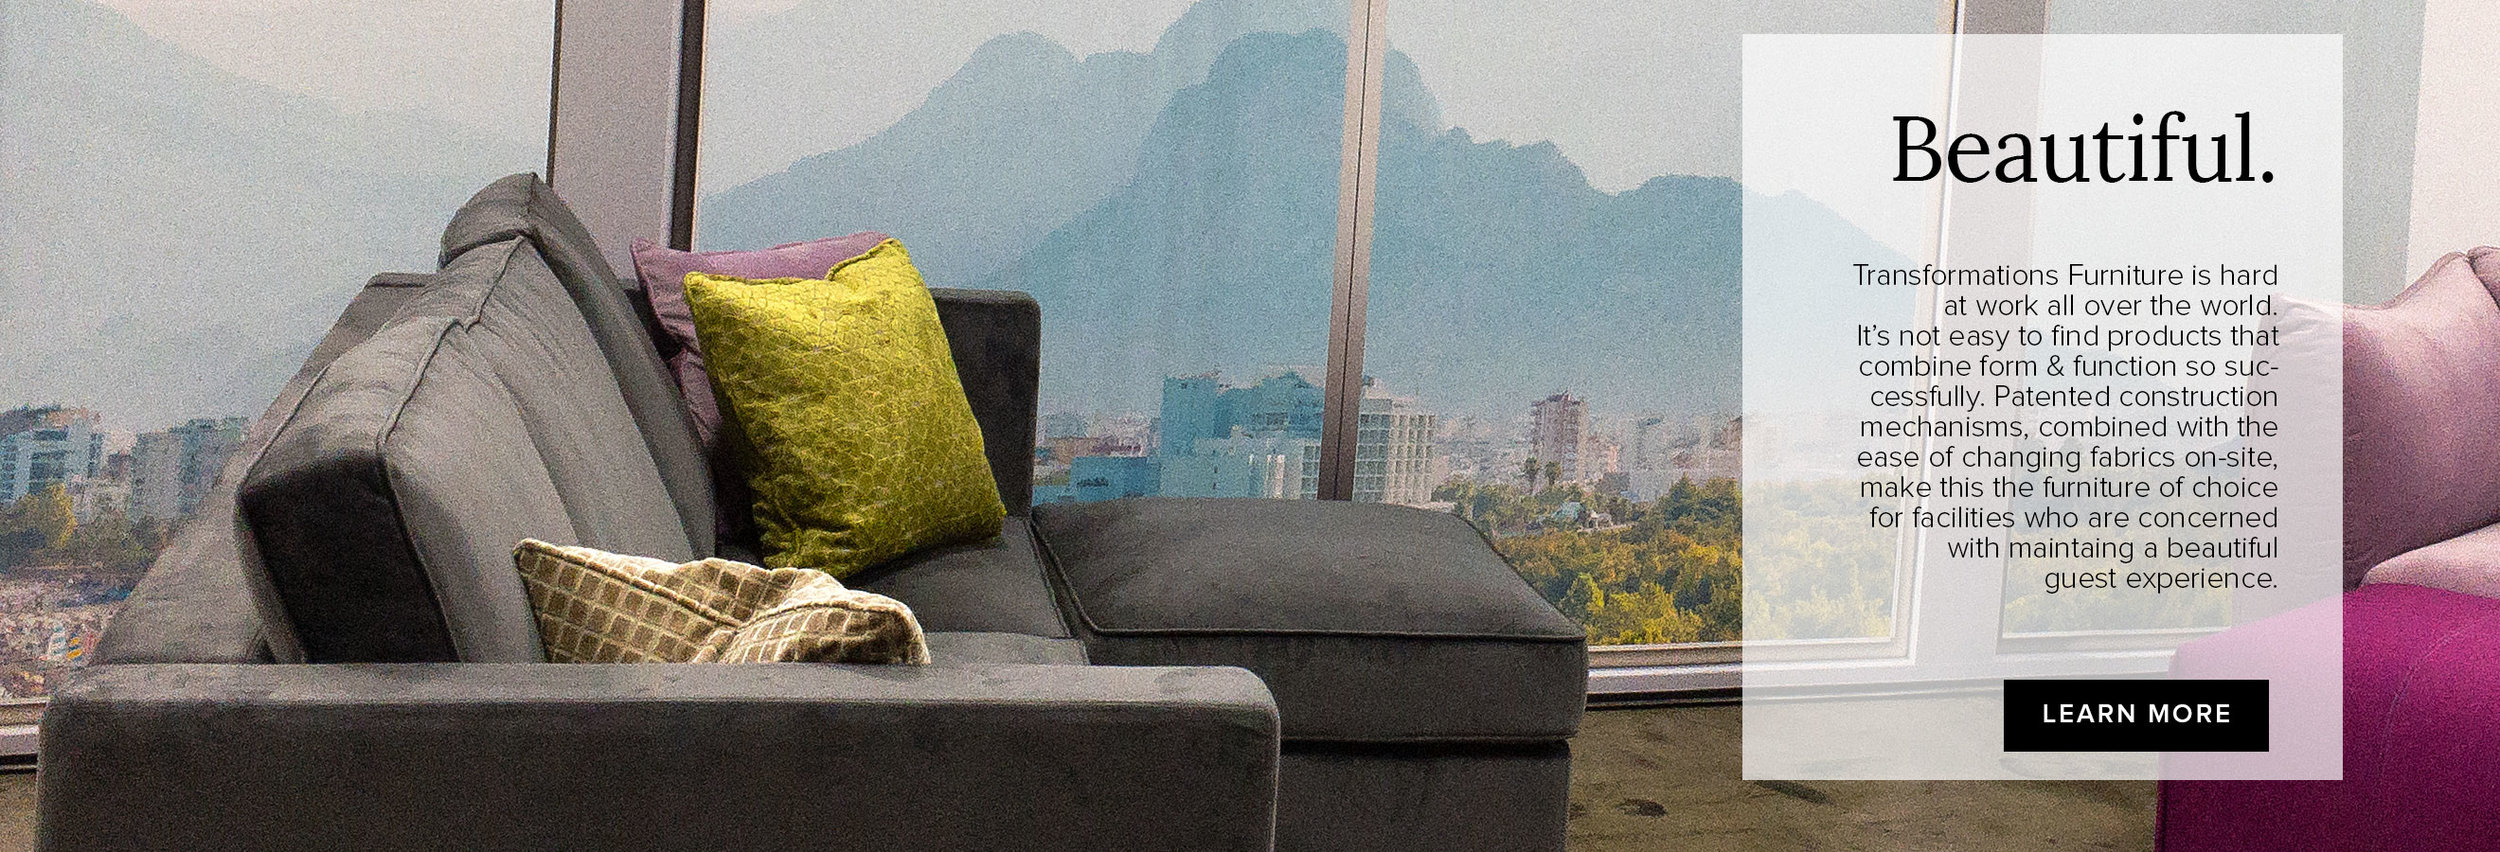 banner_grp9_mountains.jpg